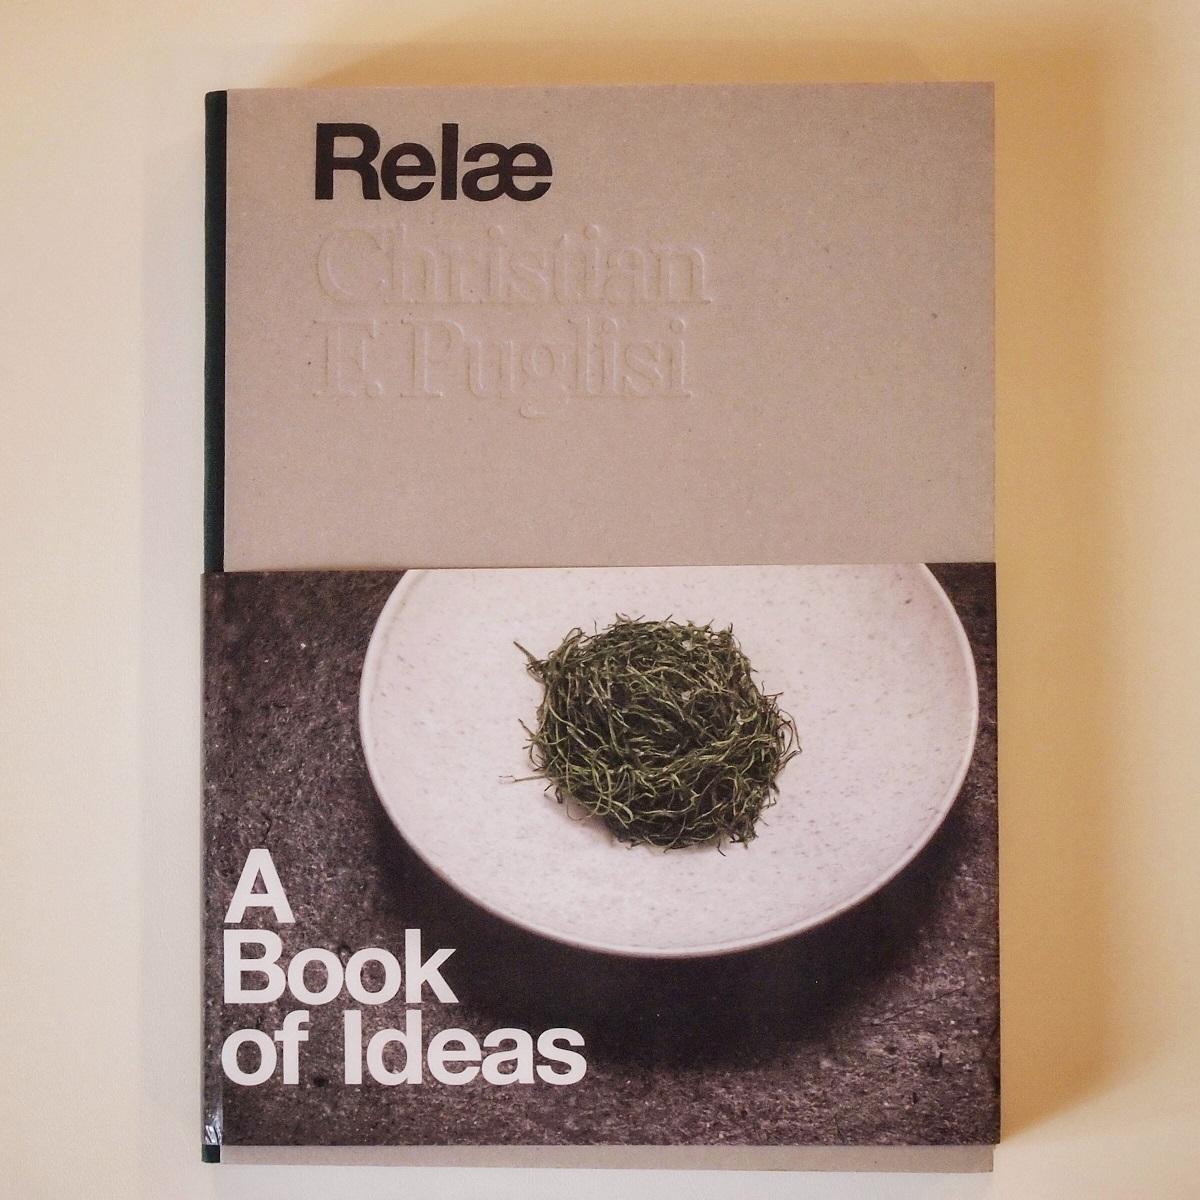 Relae by Christian F. Puglisi